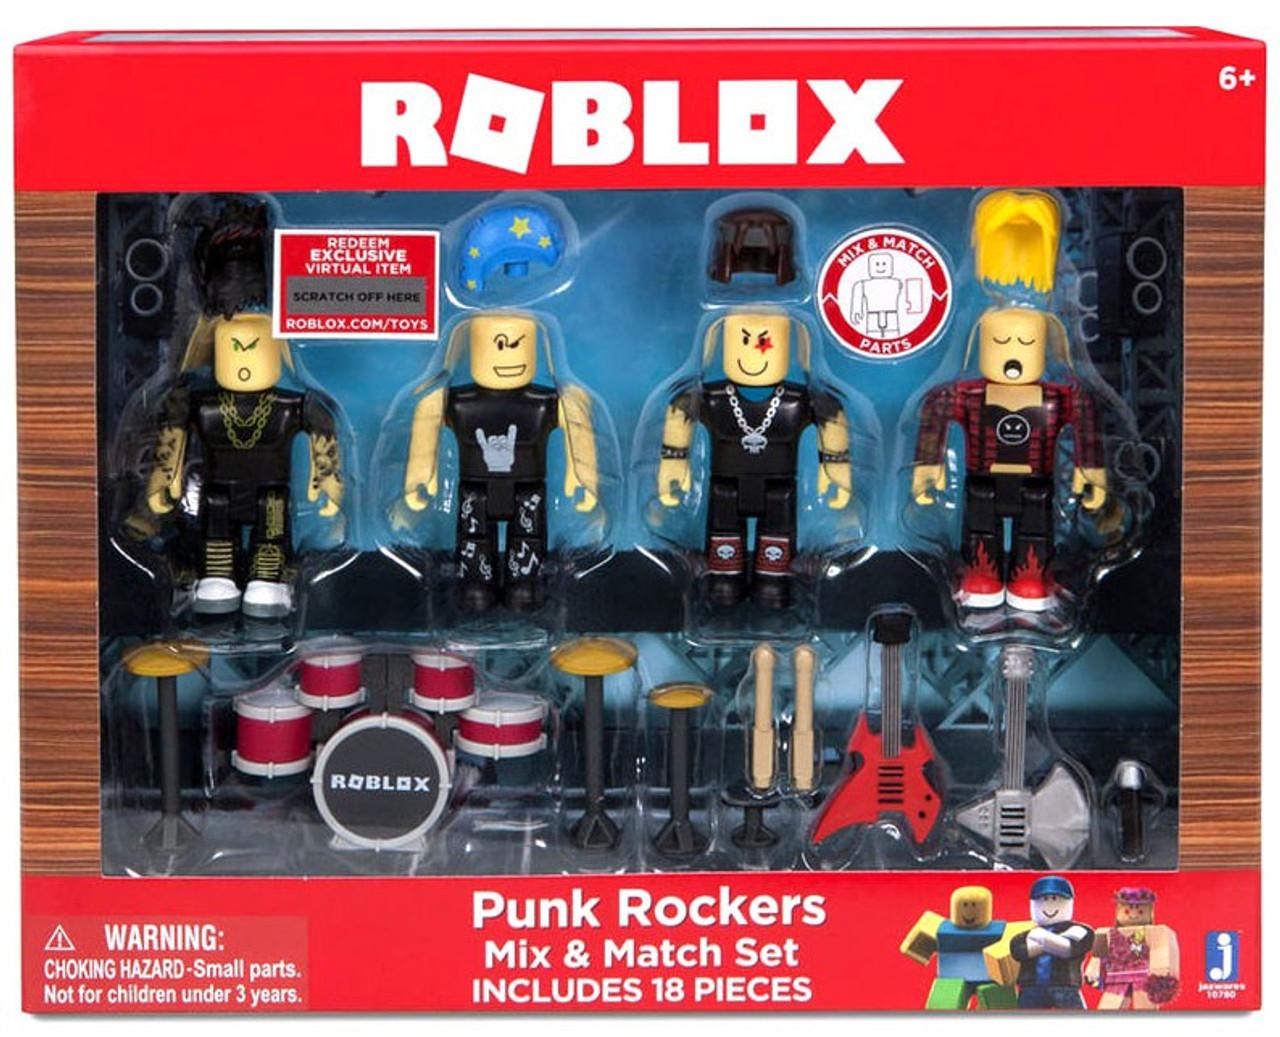 Roblox Mix & Match Punk Rockers Figure 4-Pack Set